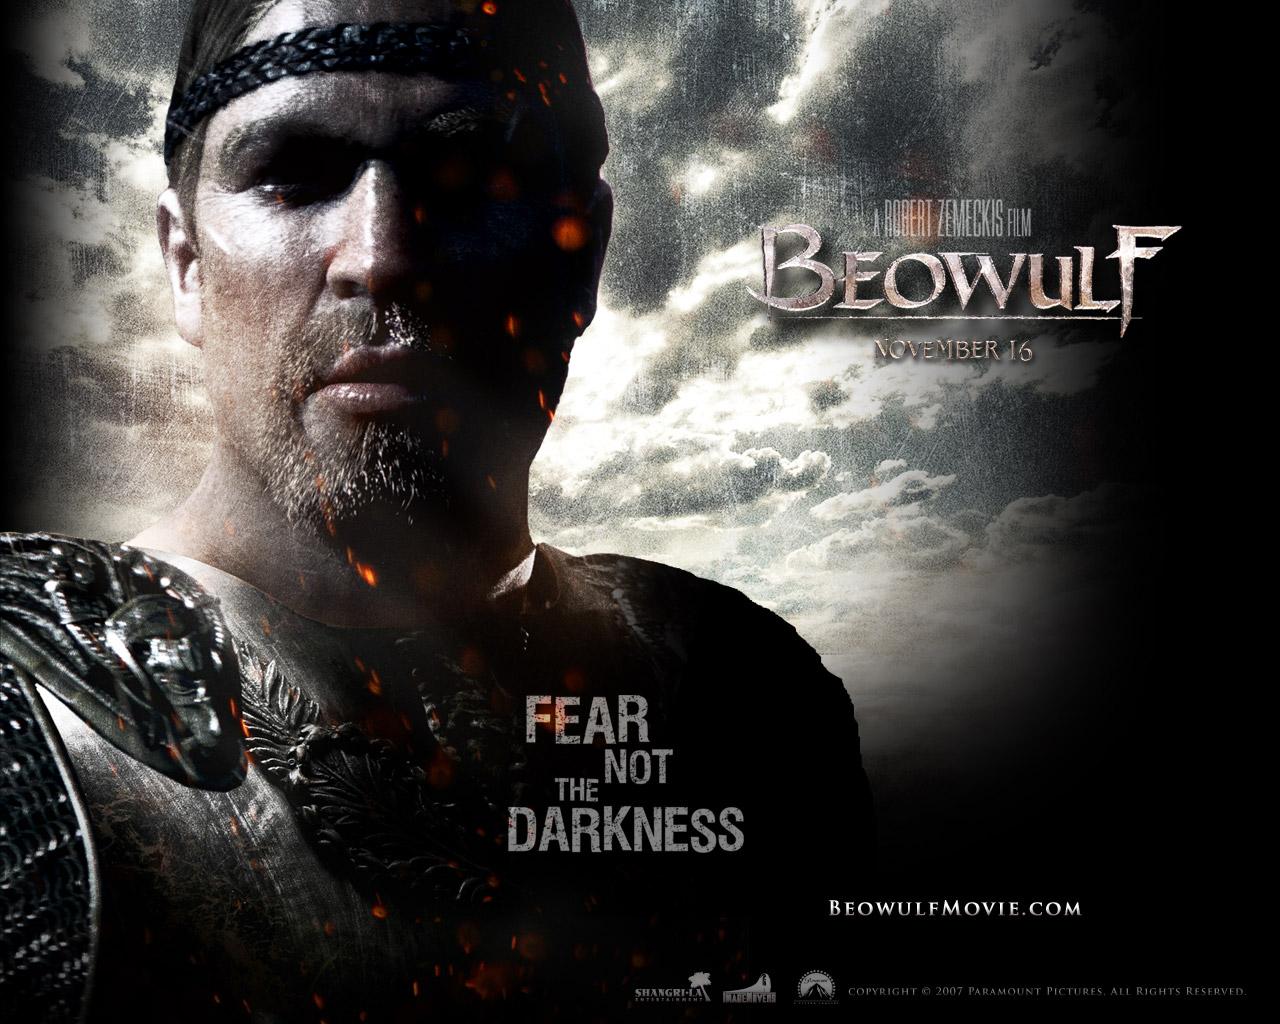 Beowulf Beowulf